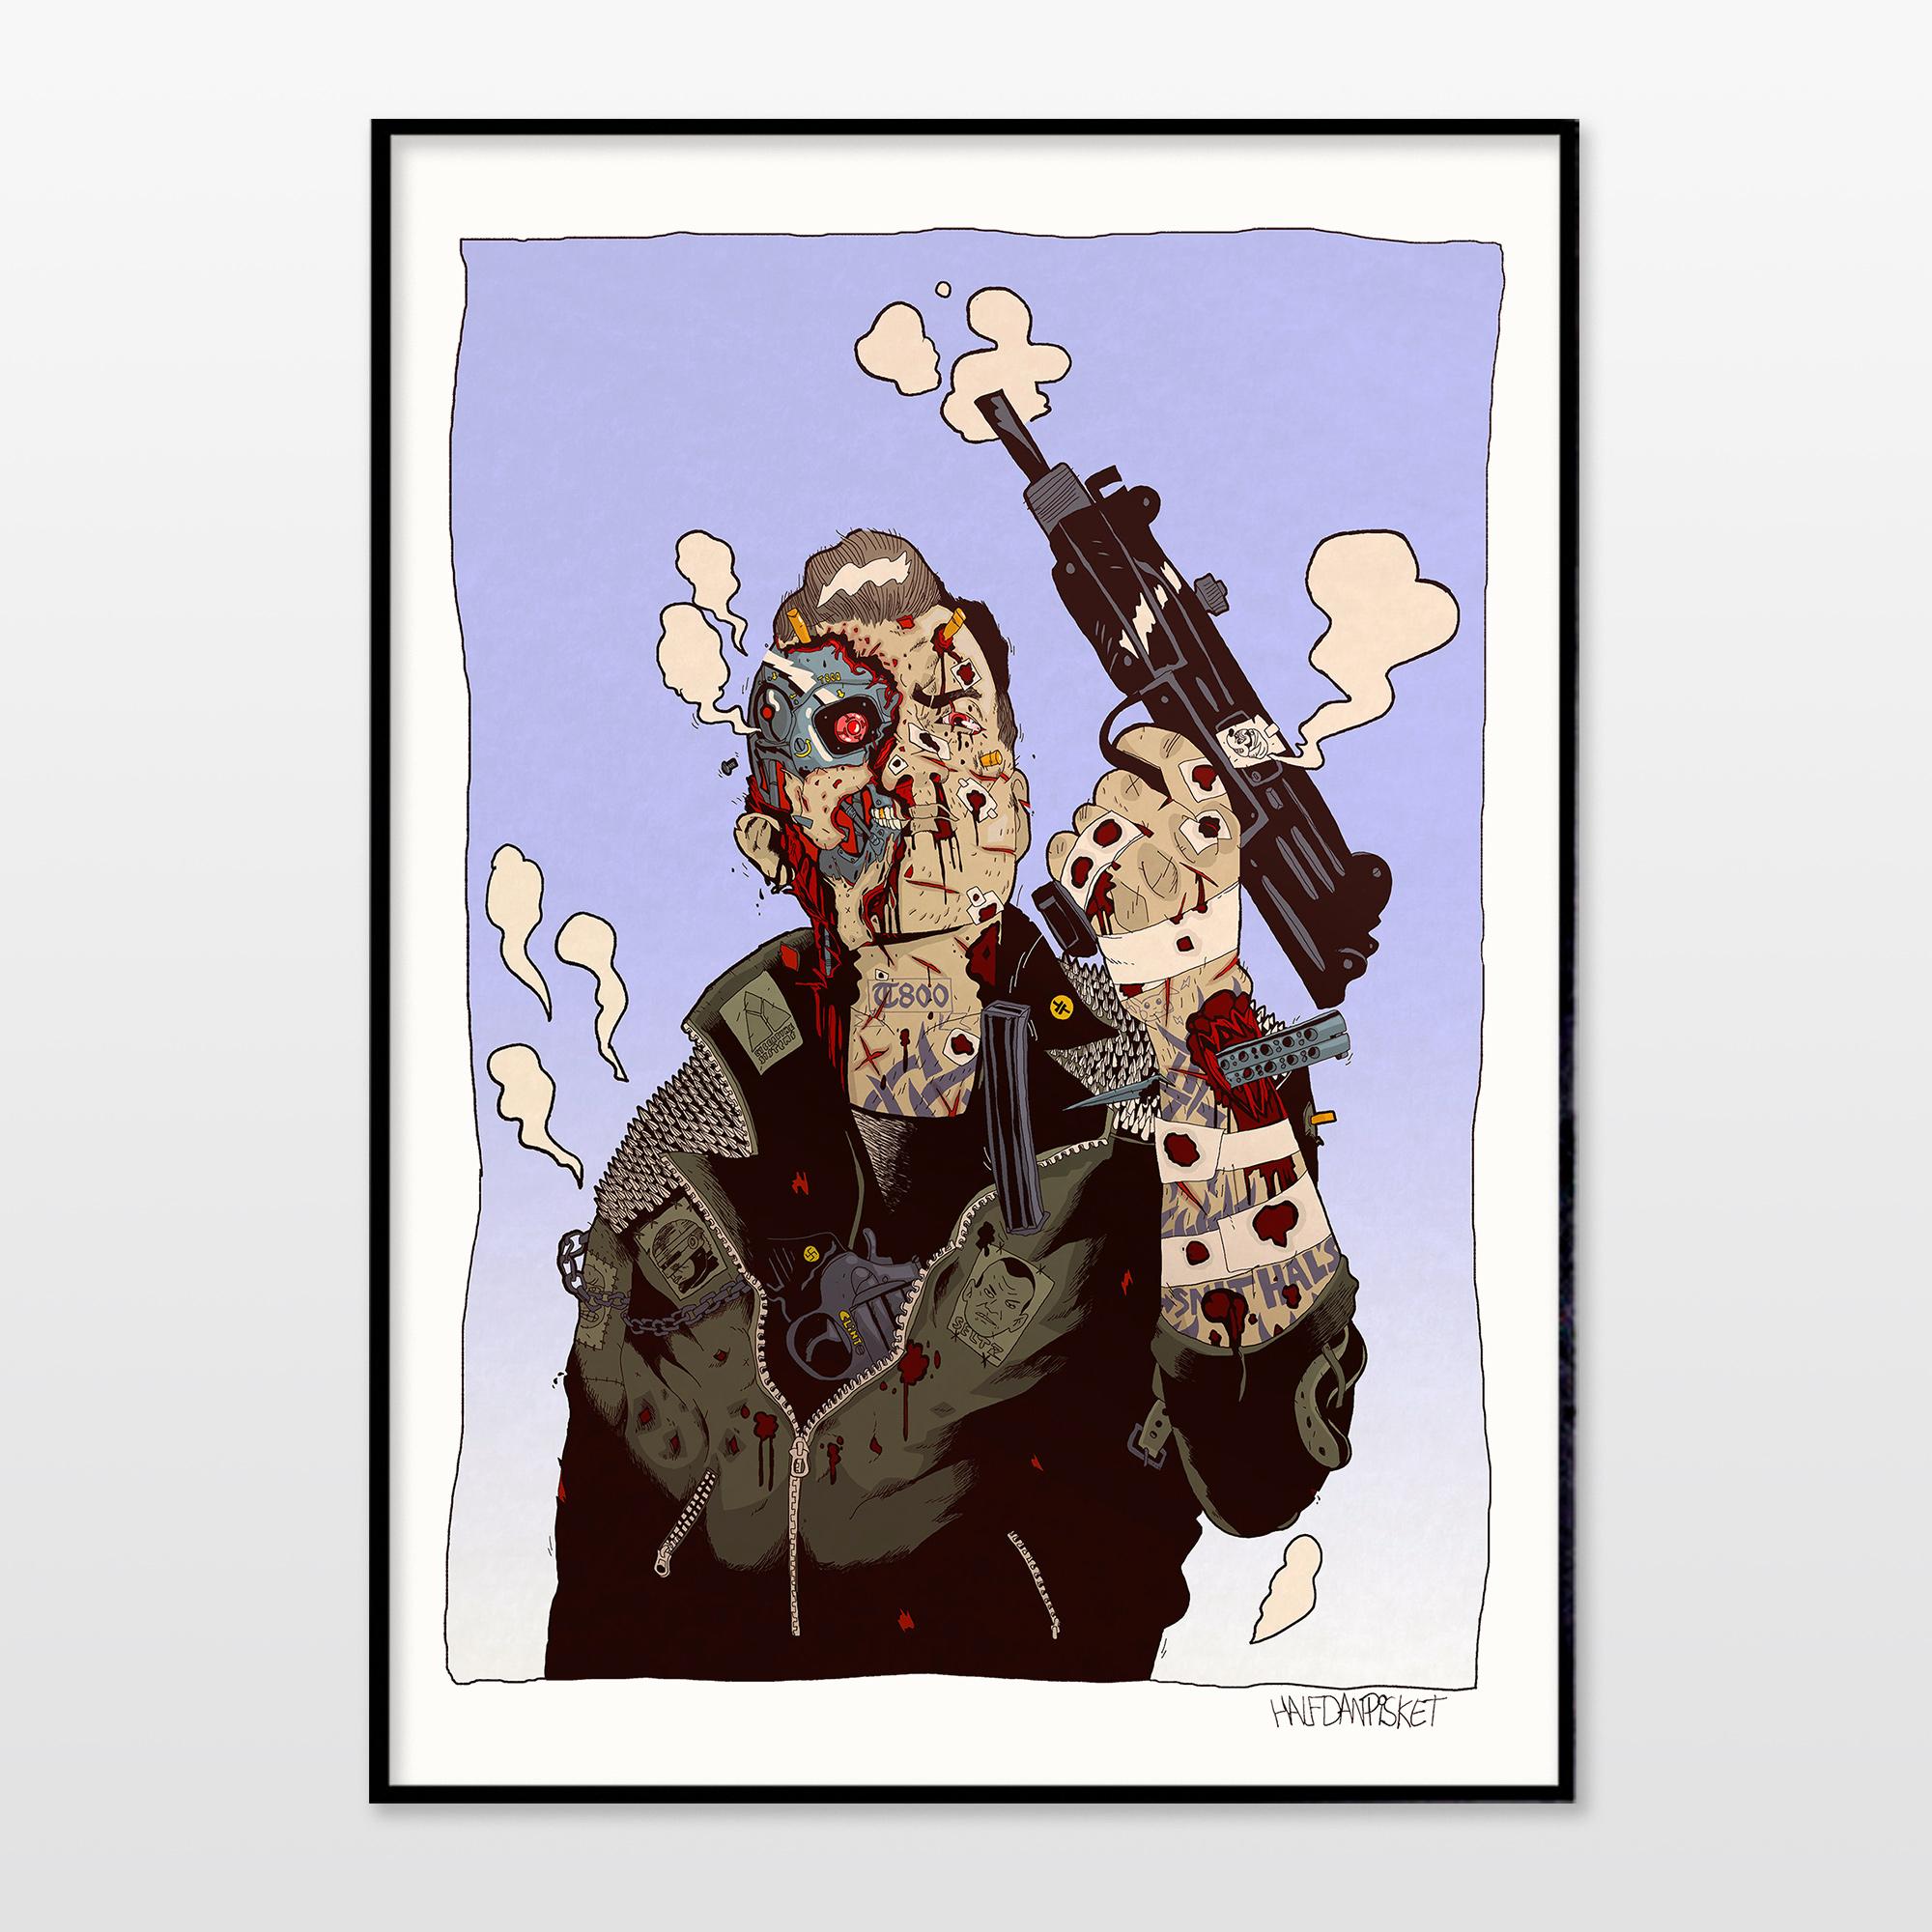 posters-prints, giclee-print, illustrative, portraiture, surrealistic, cartoons, people, science, beige, black, blue, ink, paper, amusing, contemporary-art, copenhagen, danish, decorative, interior, interior-design, men, modern, modern-art, nordic, posters, prints, scandinavien, Buy original high quality art. Paintings, drawings, limited edition prints & posters by talented artists.